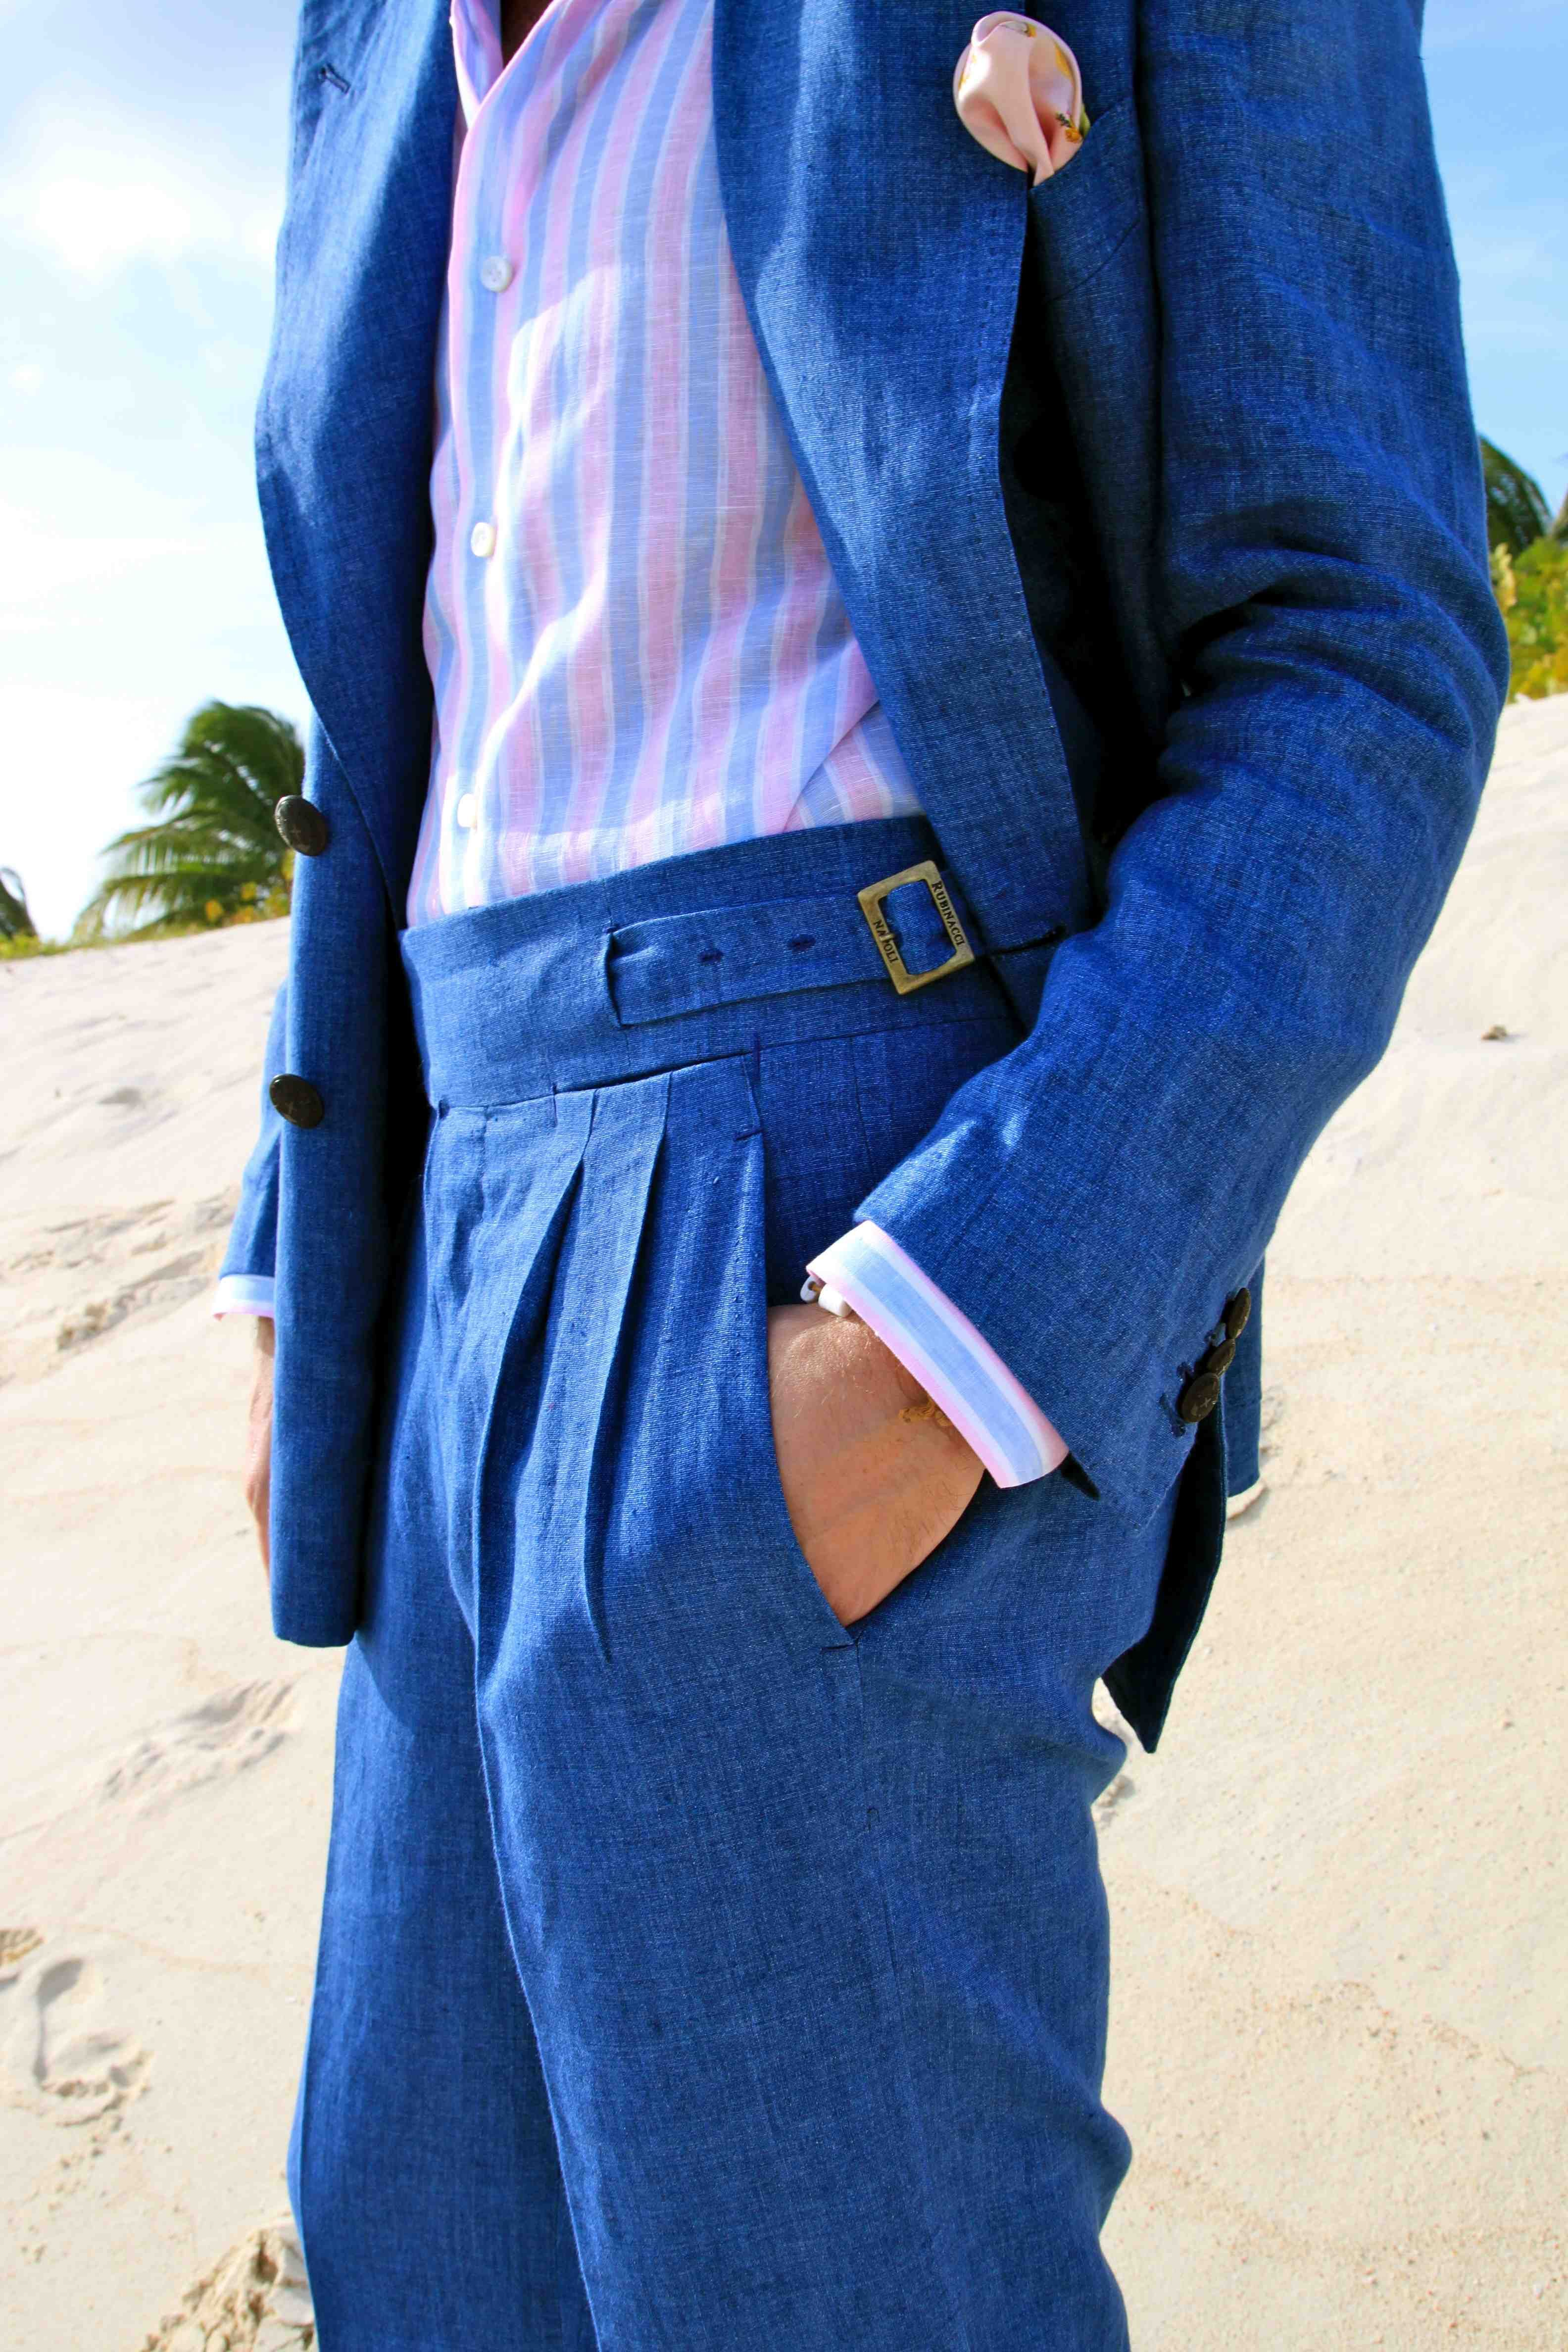 Gagliardi Linen Jacket Review Gentleman S Gazette With Images